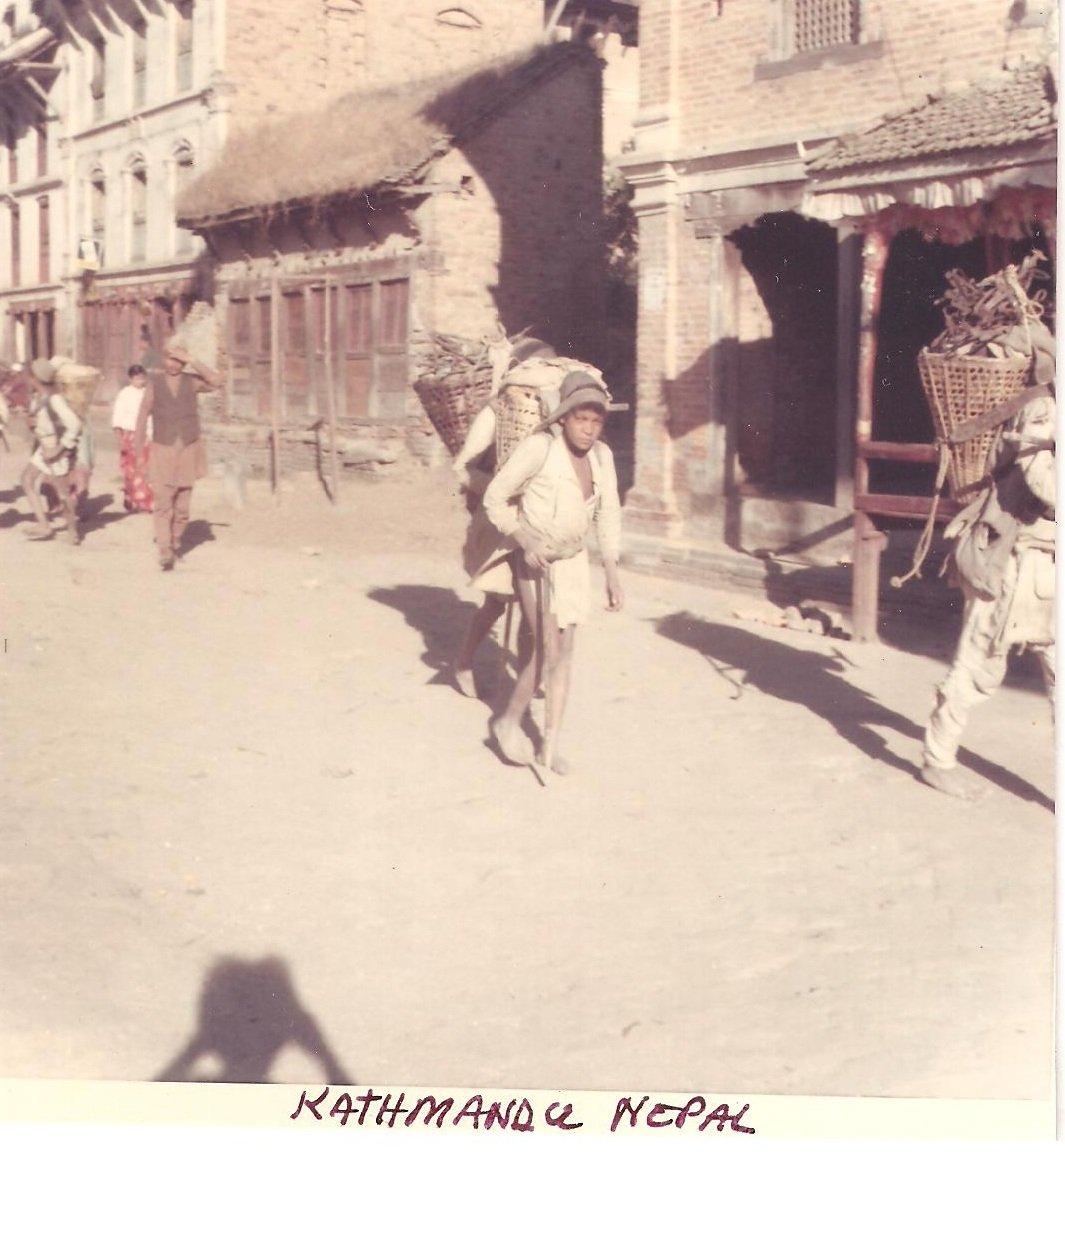 Vintage Photograph Walking Vendors Streets Kathmandu Nepal 1968